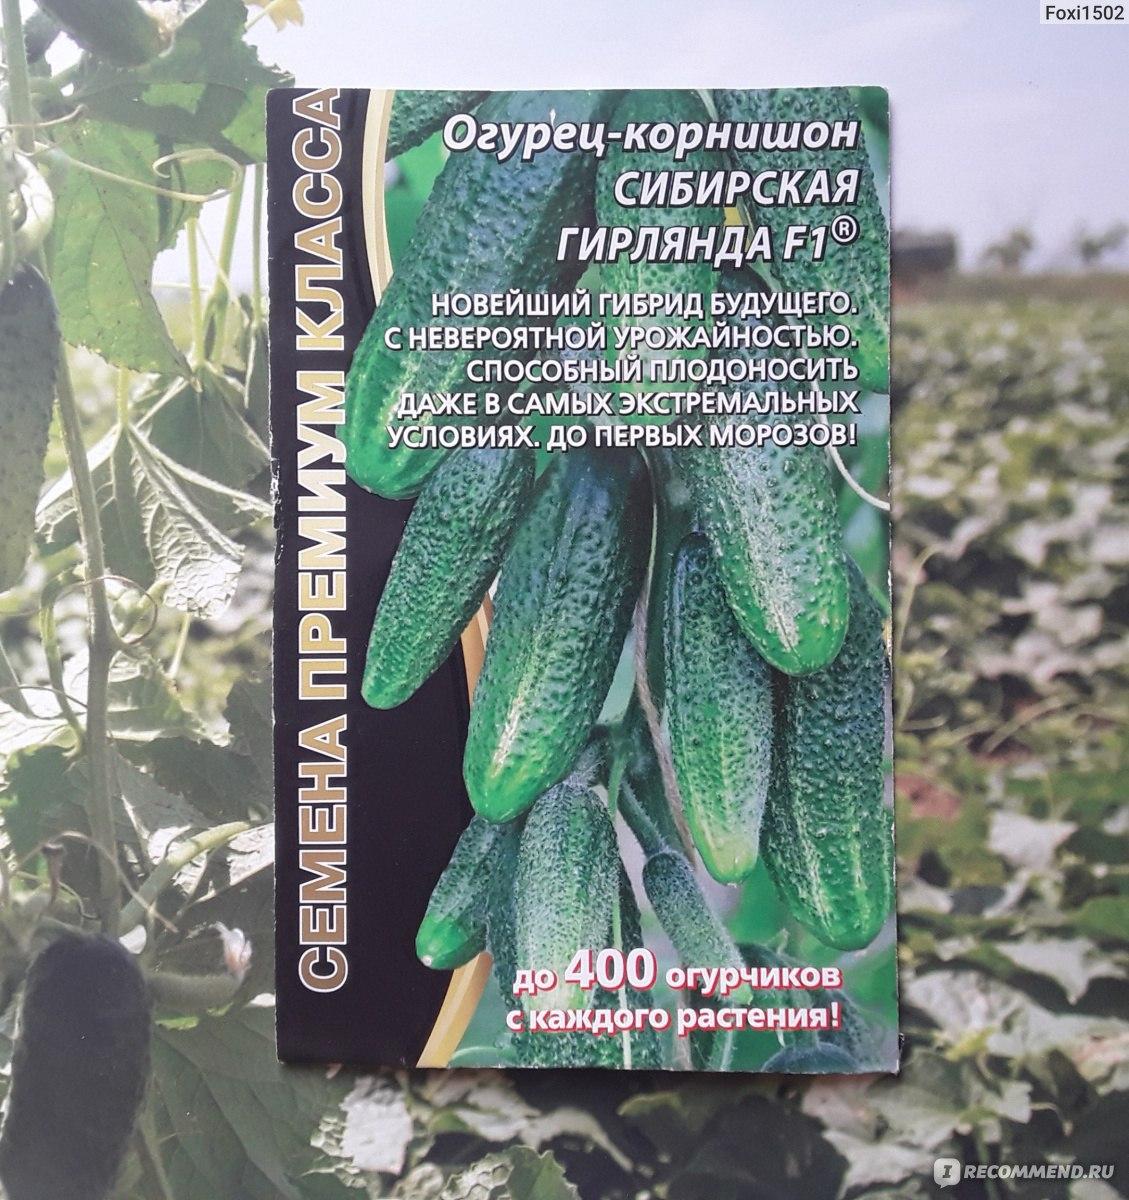 Огурец куманек f1 — описание и характеристика сорта